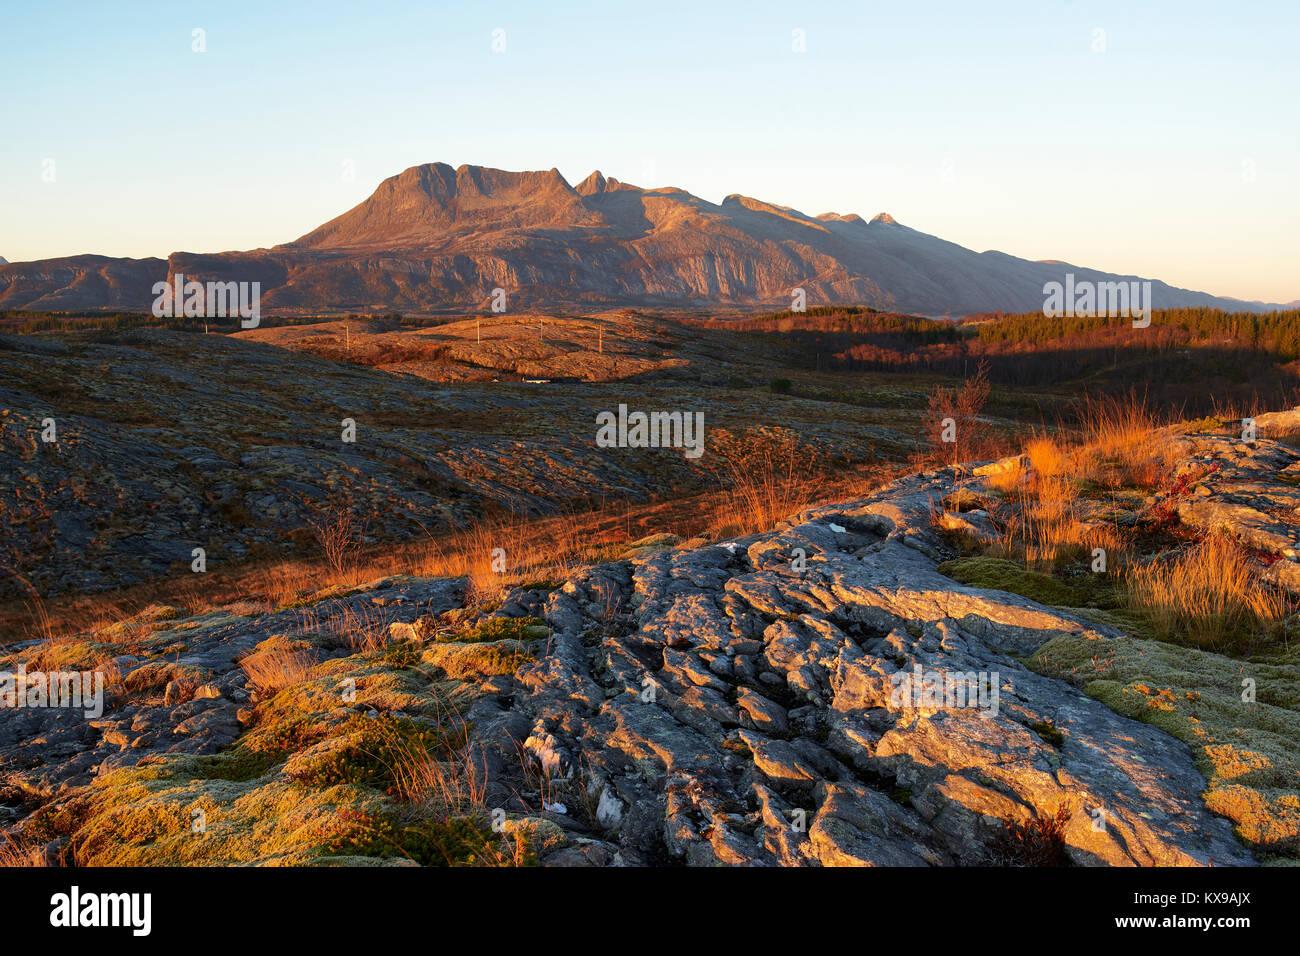 De syv søstre, Seven Sisters Mountain range, Alstahaug, Nordland, Norway - Stock Image